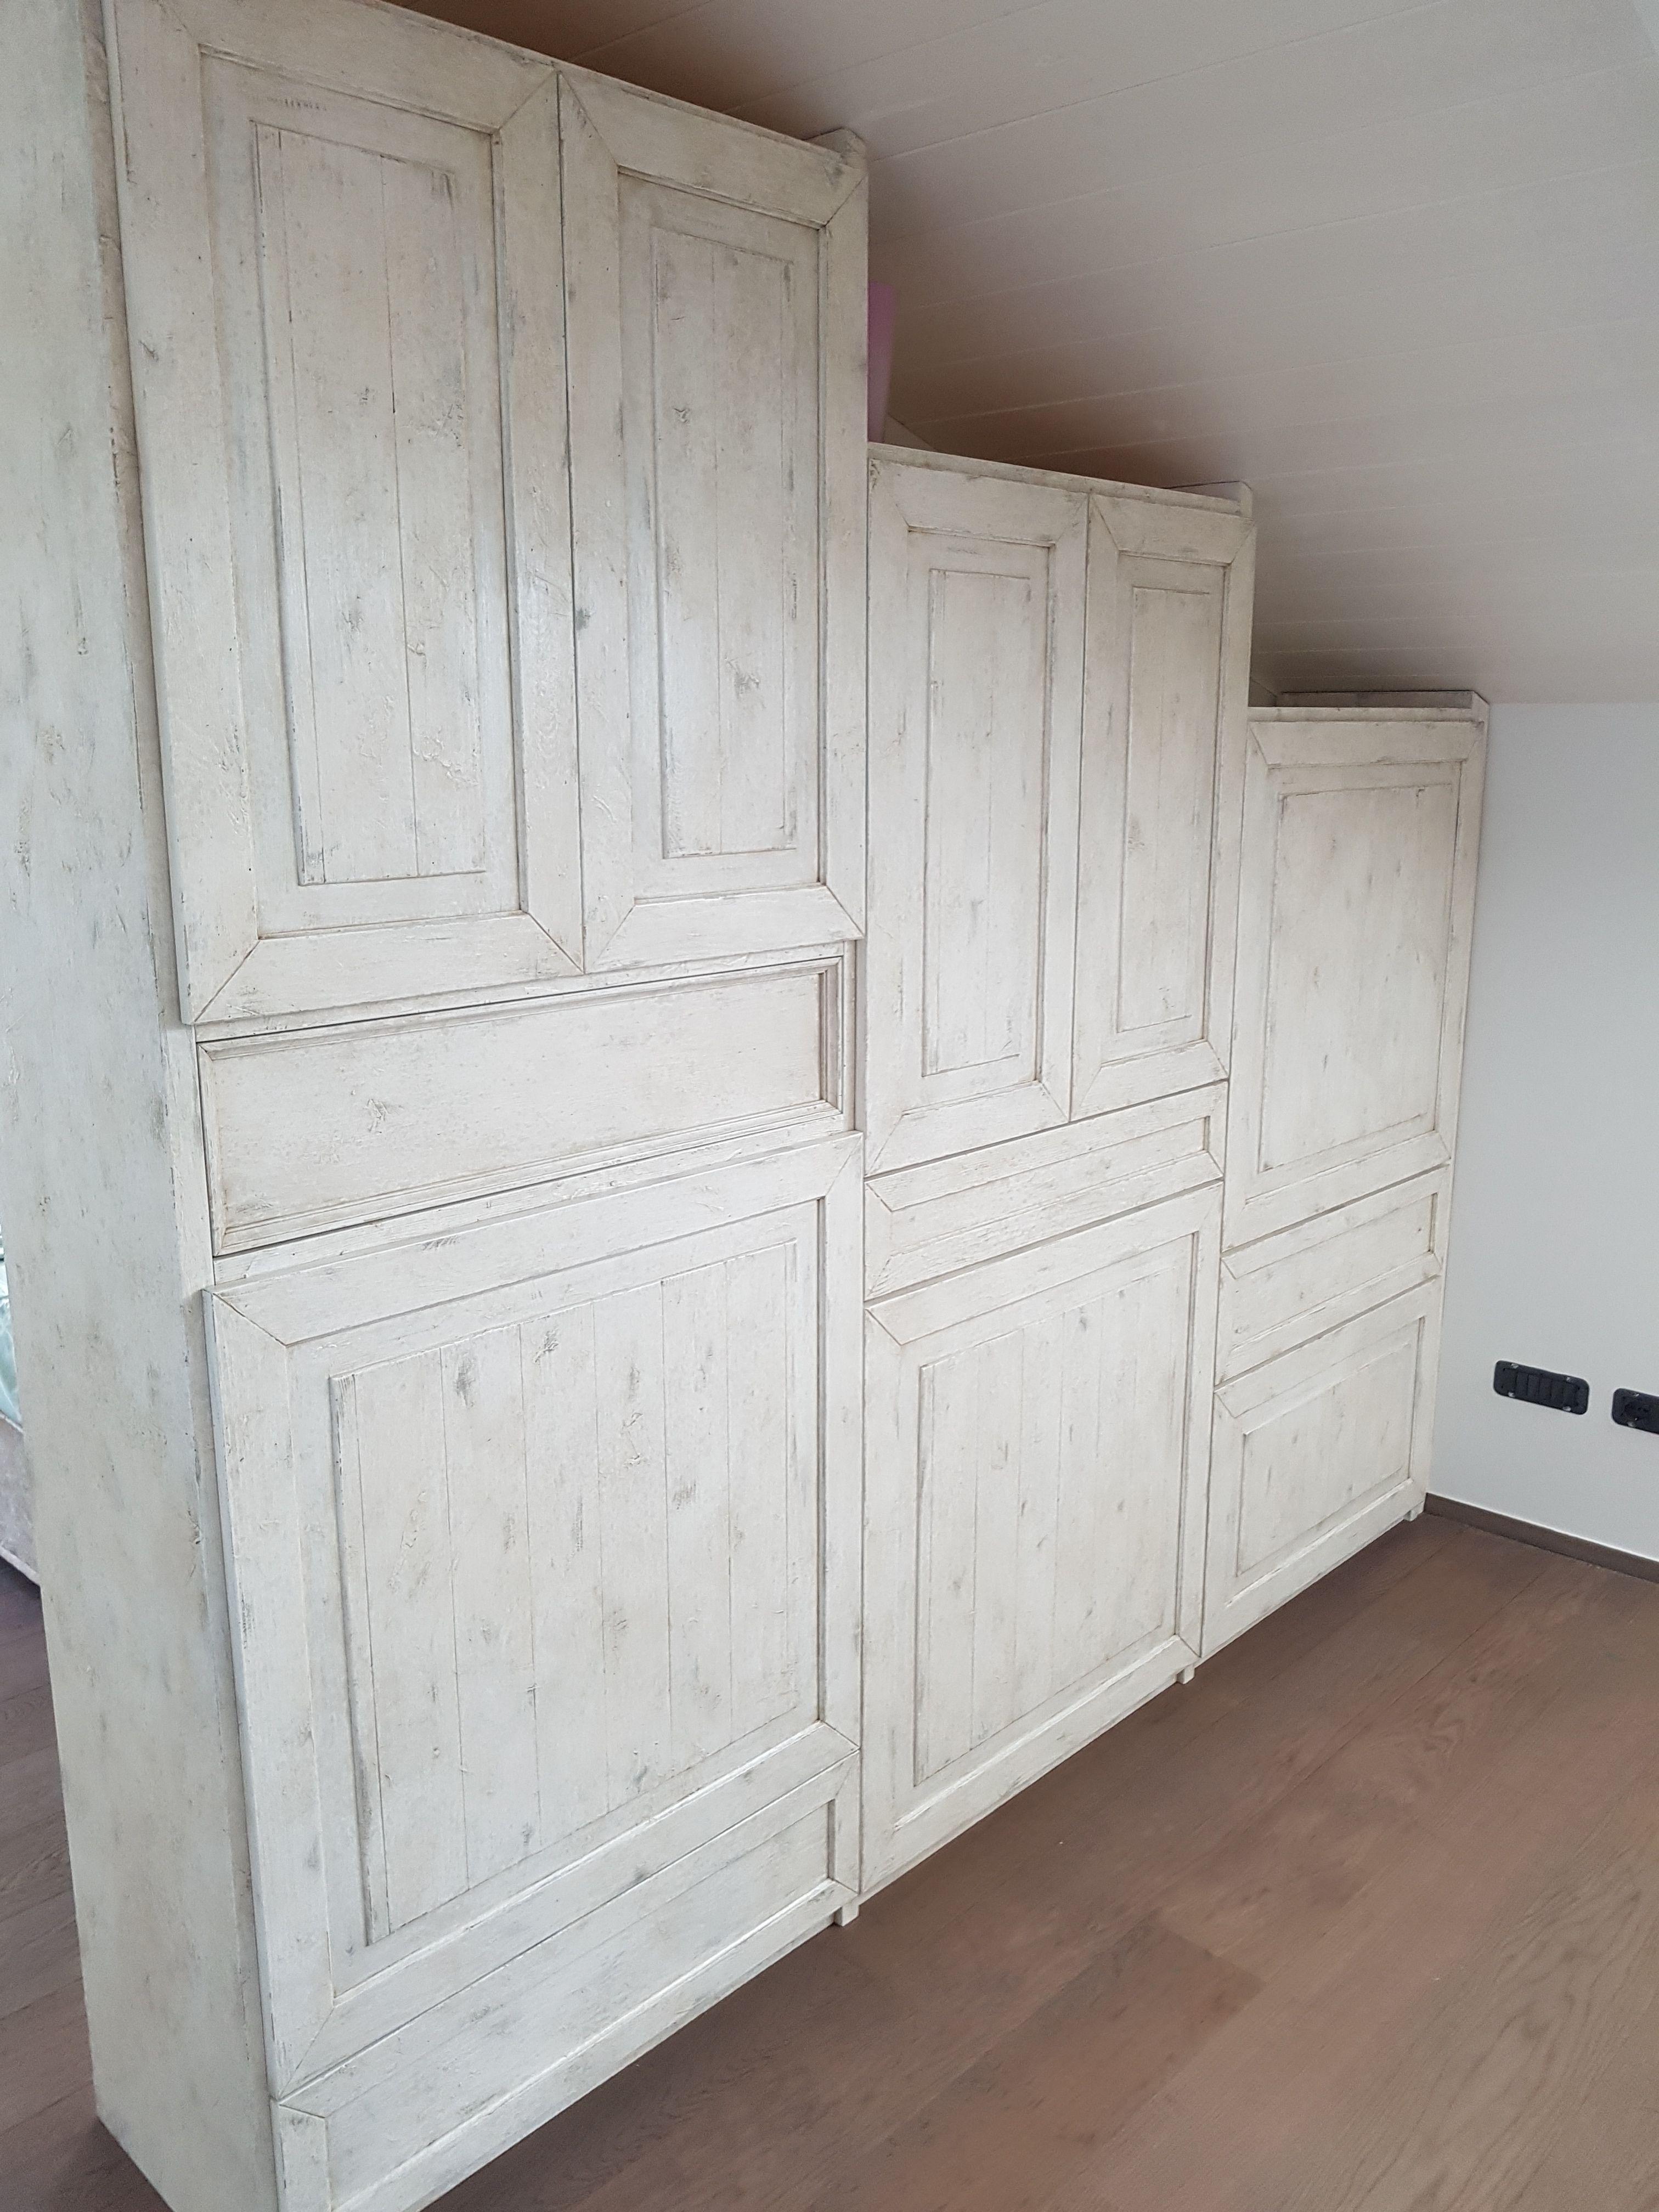 Parete Divisoria In Legno parete divisoria in legno massello dipinta e decorata a mano